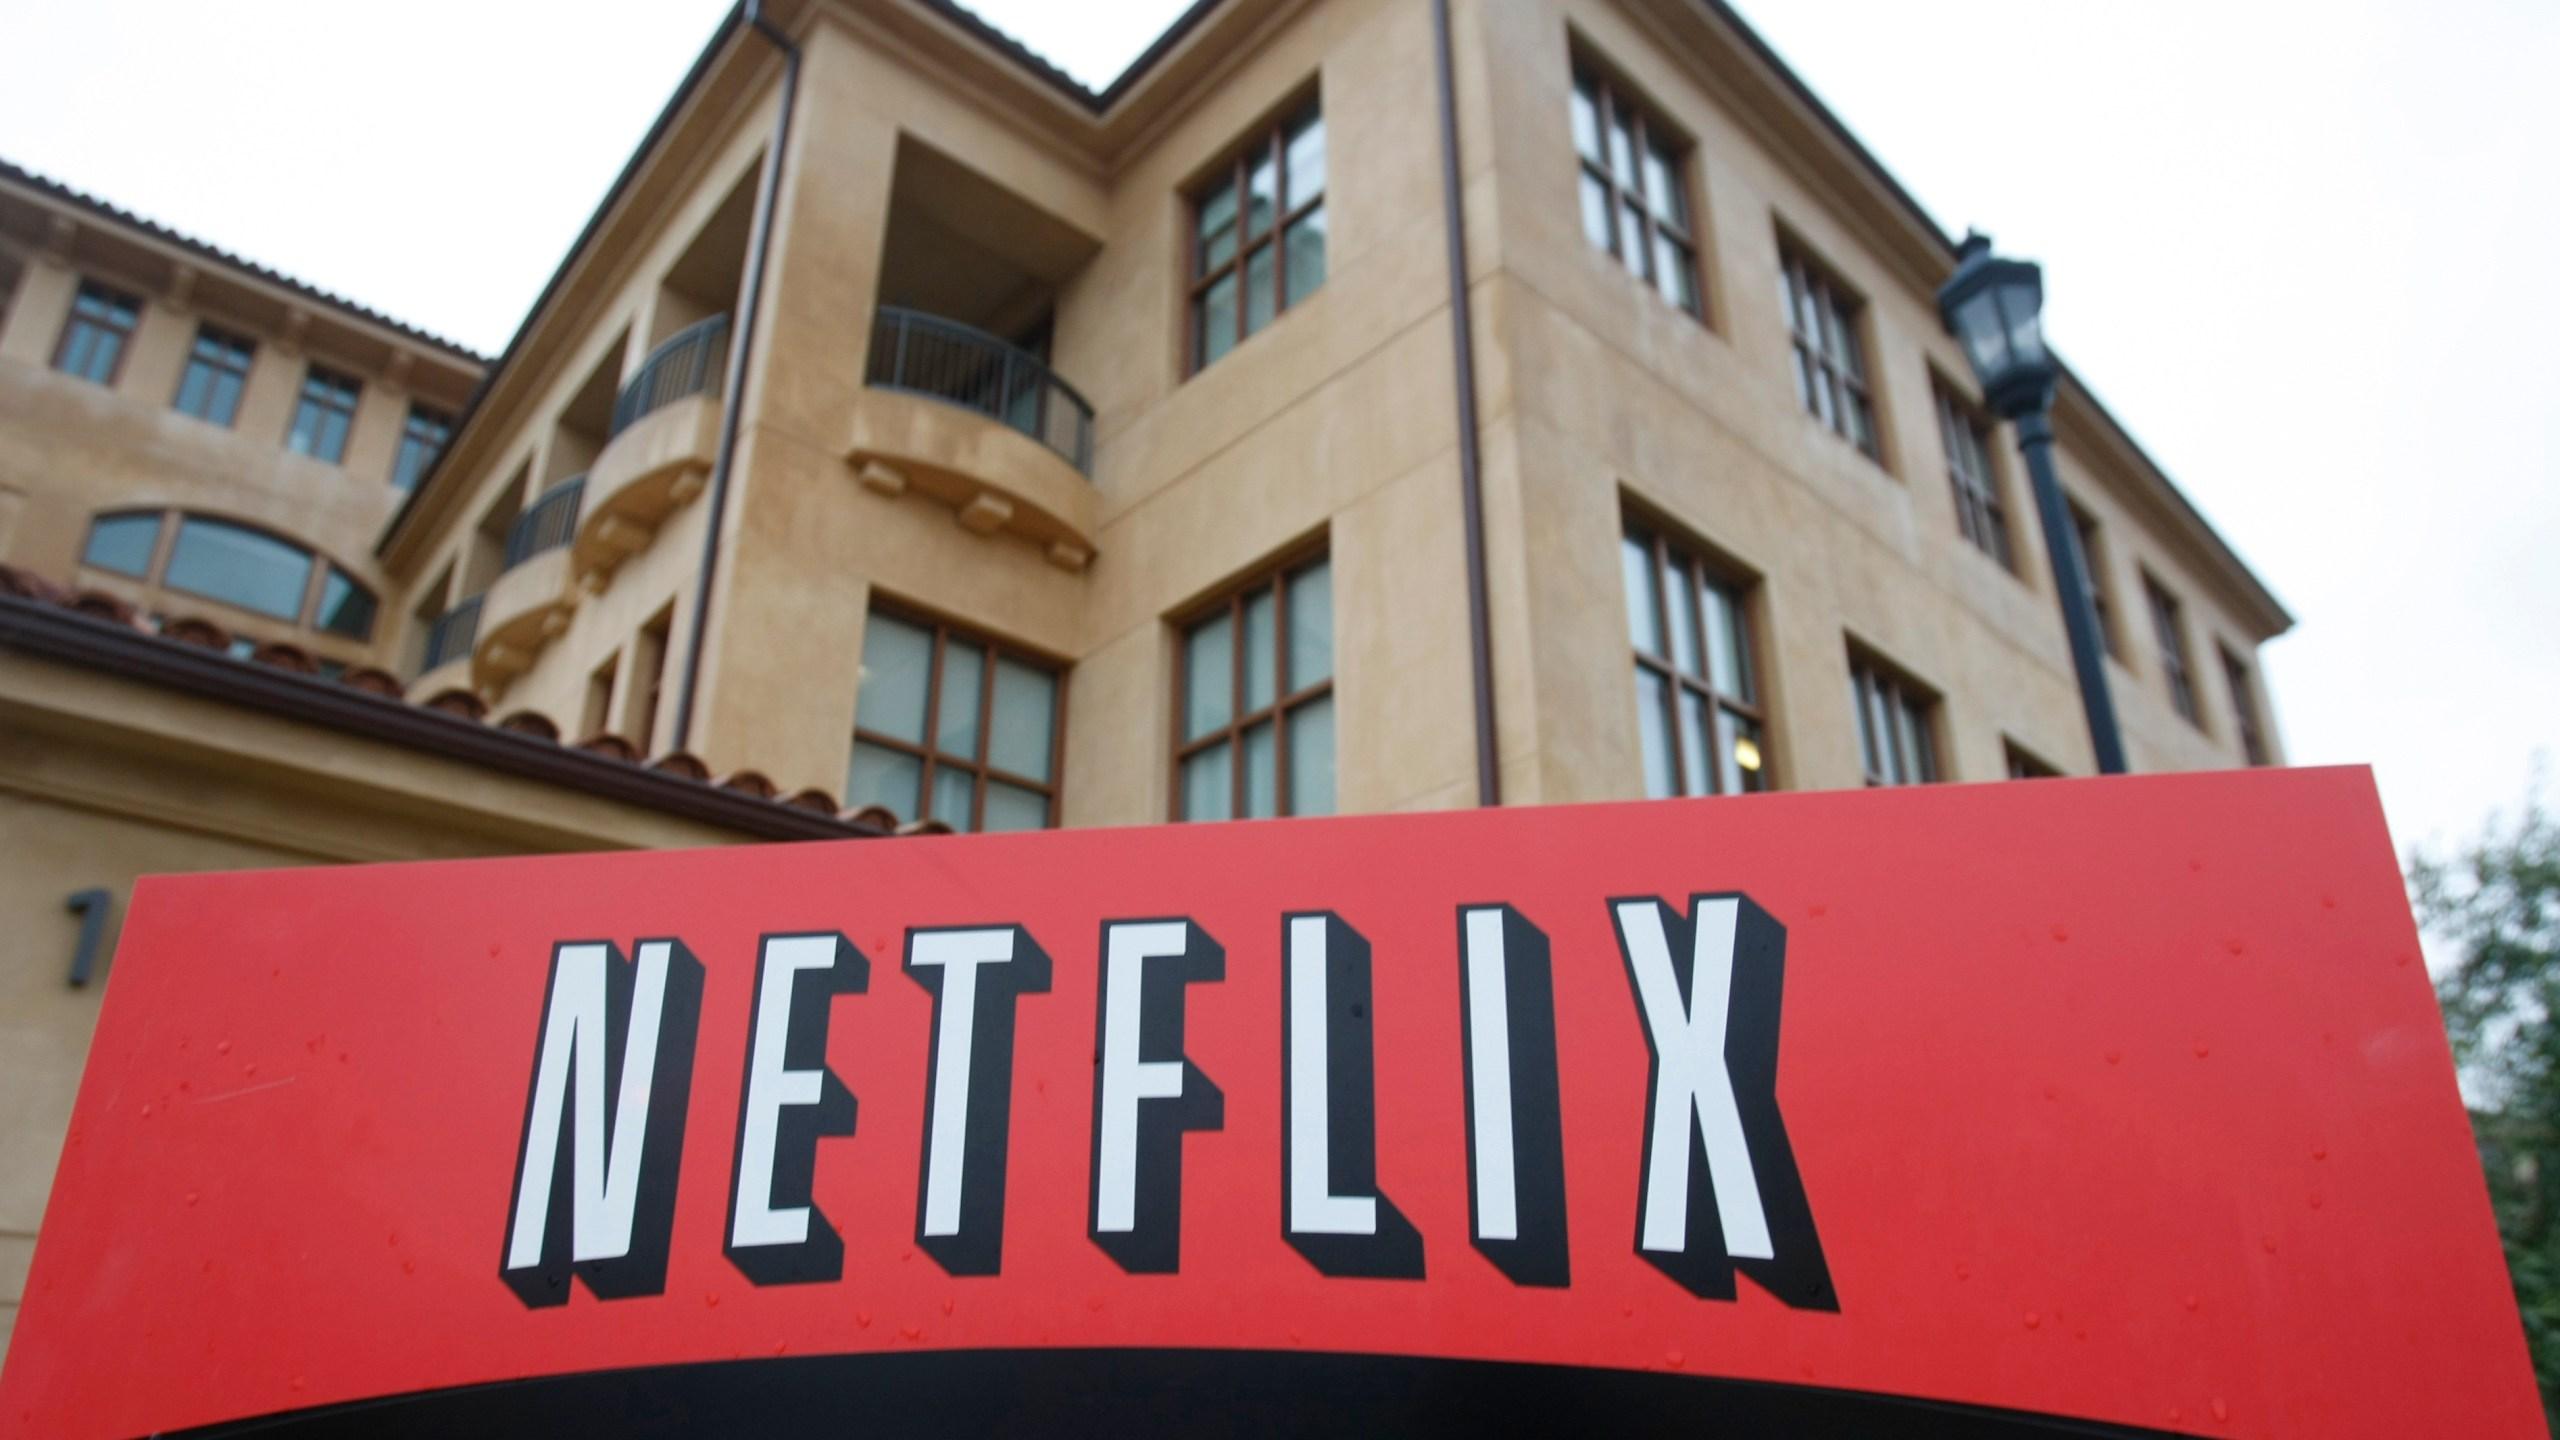 This Jan. 29, 2010, photo shows the Los Gatos headquarters of Netflix, which has hired veteran video game executive Mike Verdu. (AP Photo/Marcio Jose Sanchez)